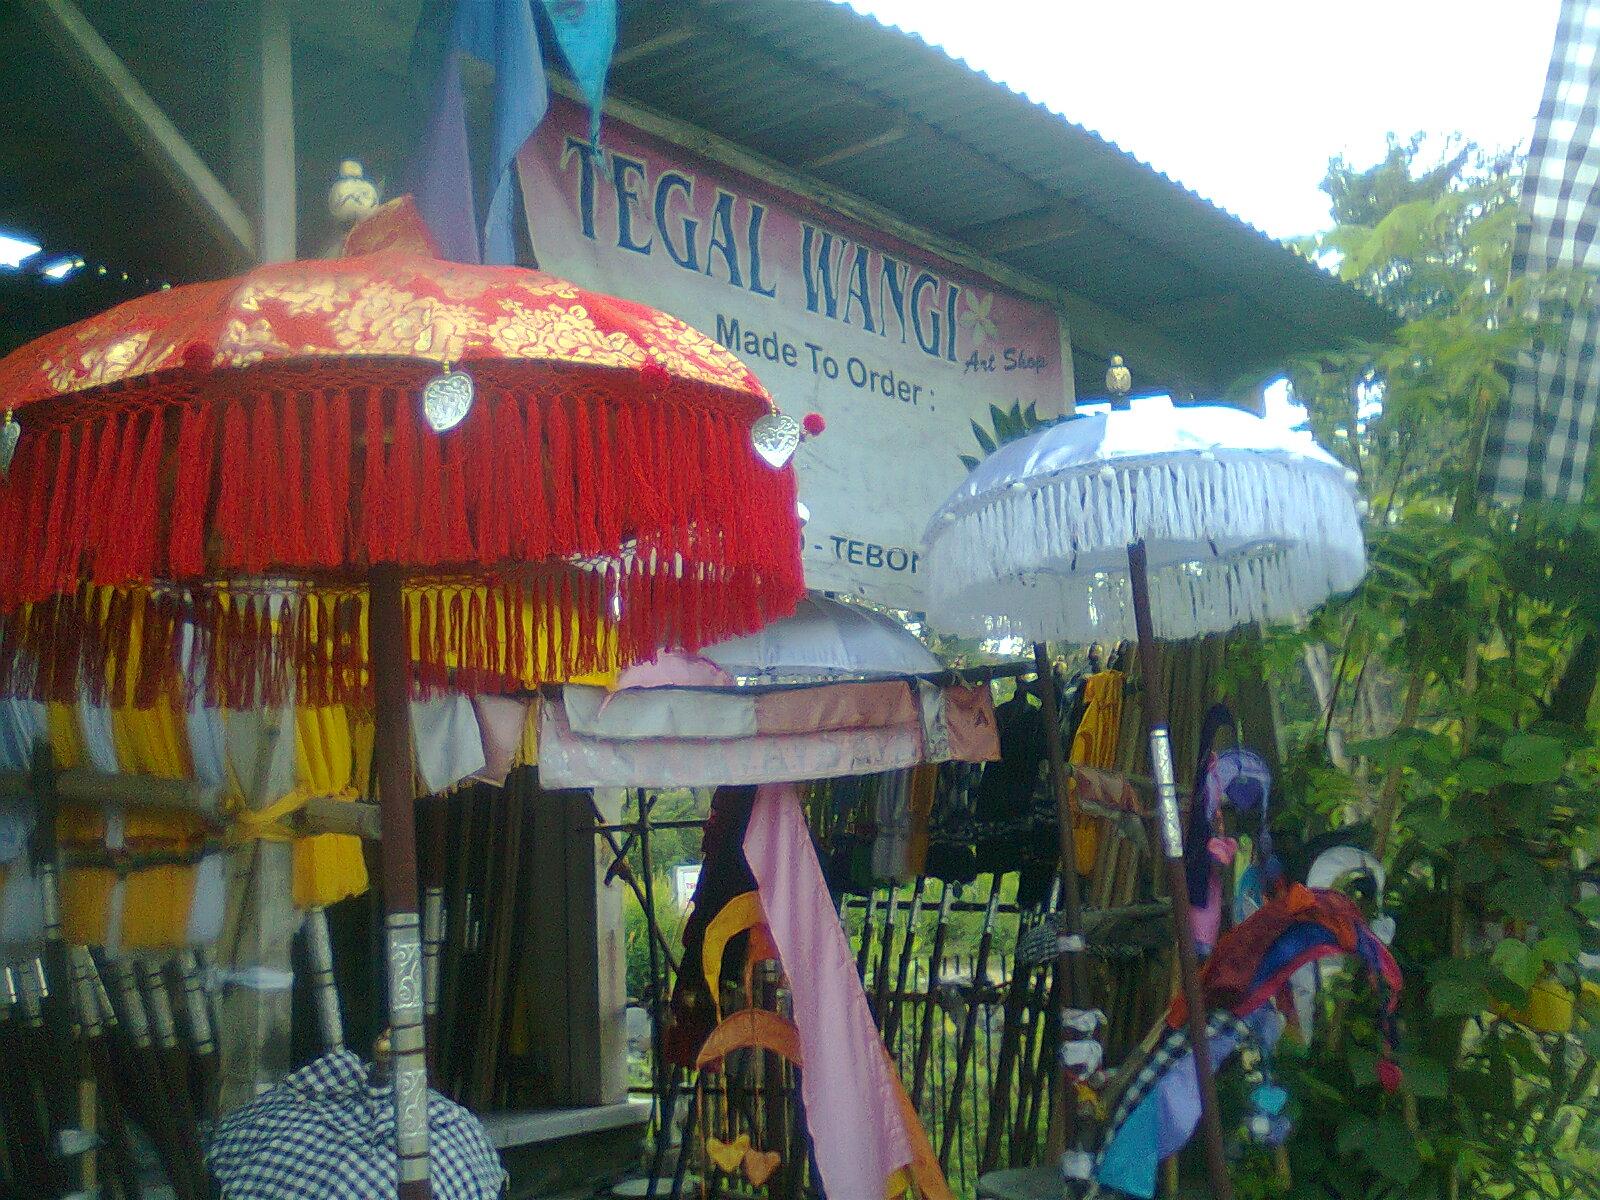 Payung Dan Umbul Tradisional Bali Balinese Umbrellas And Paayungg Hitam Besarr Flags Maker